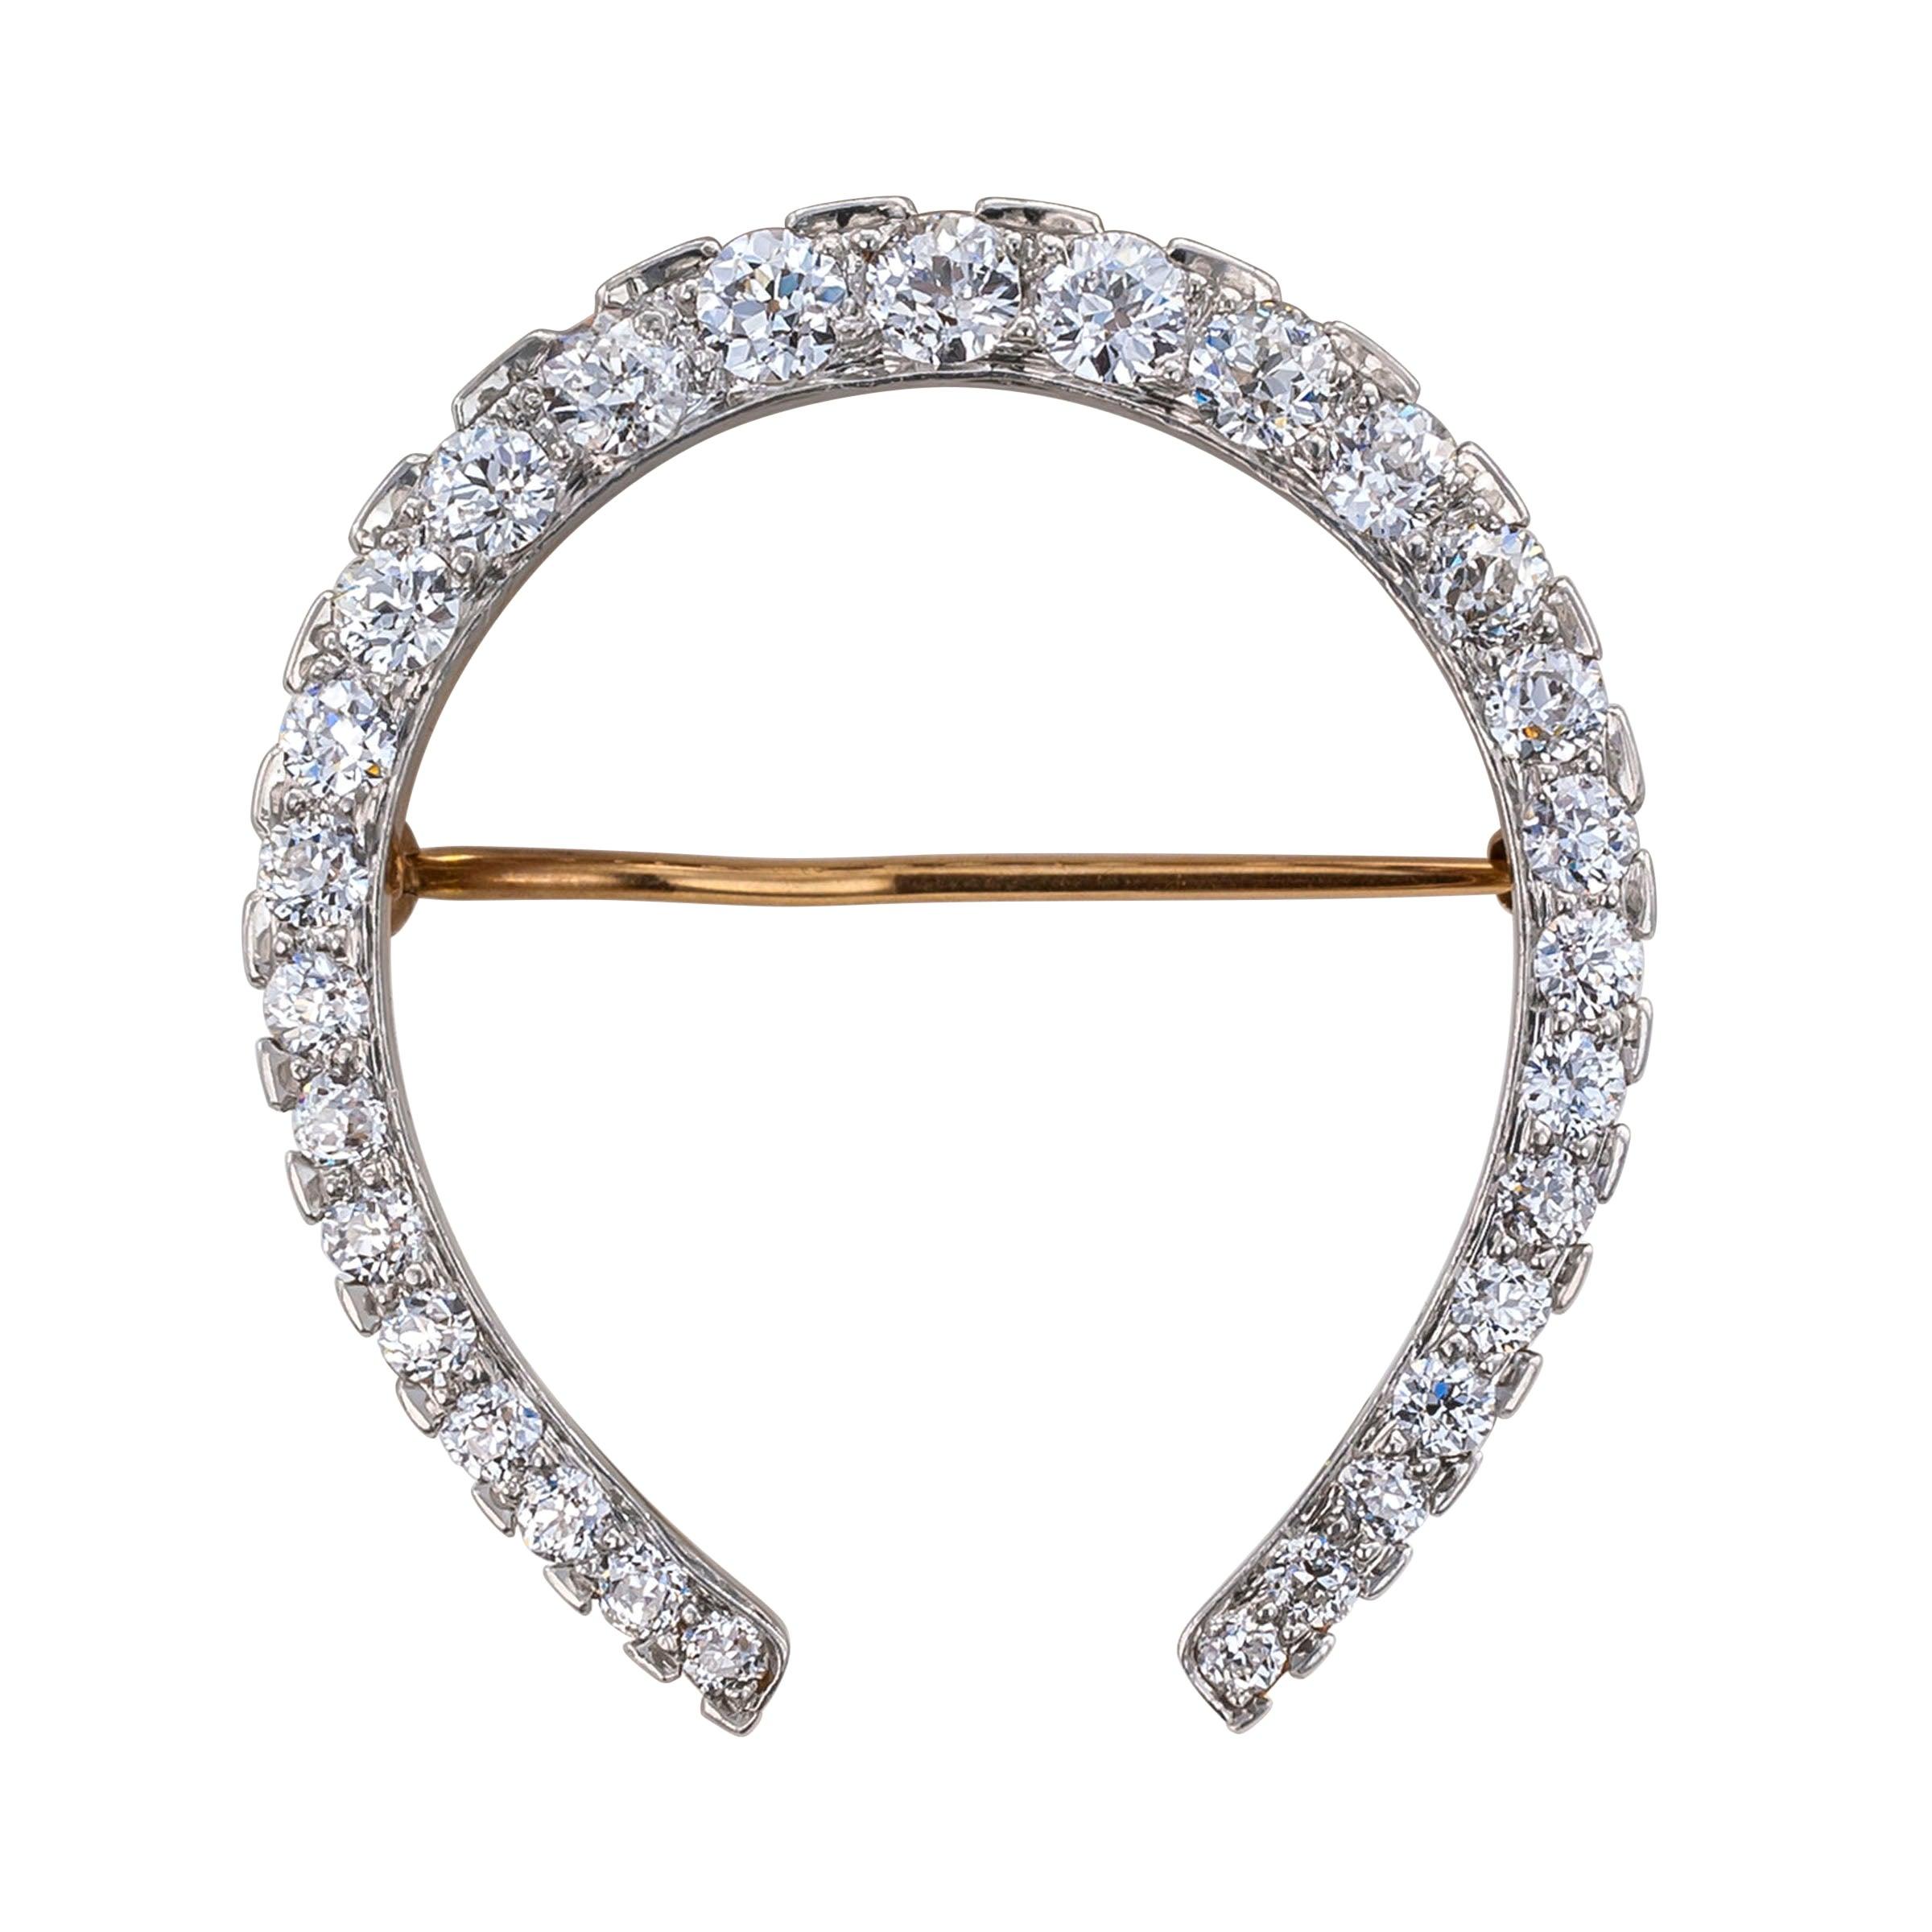 Edwardian Diamond Gold Platinum Horseshoe Brooch